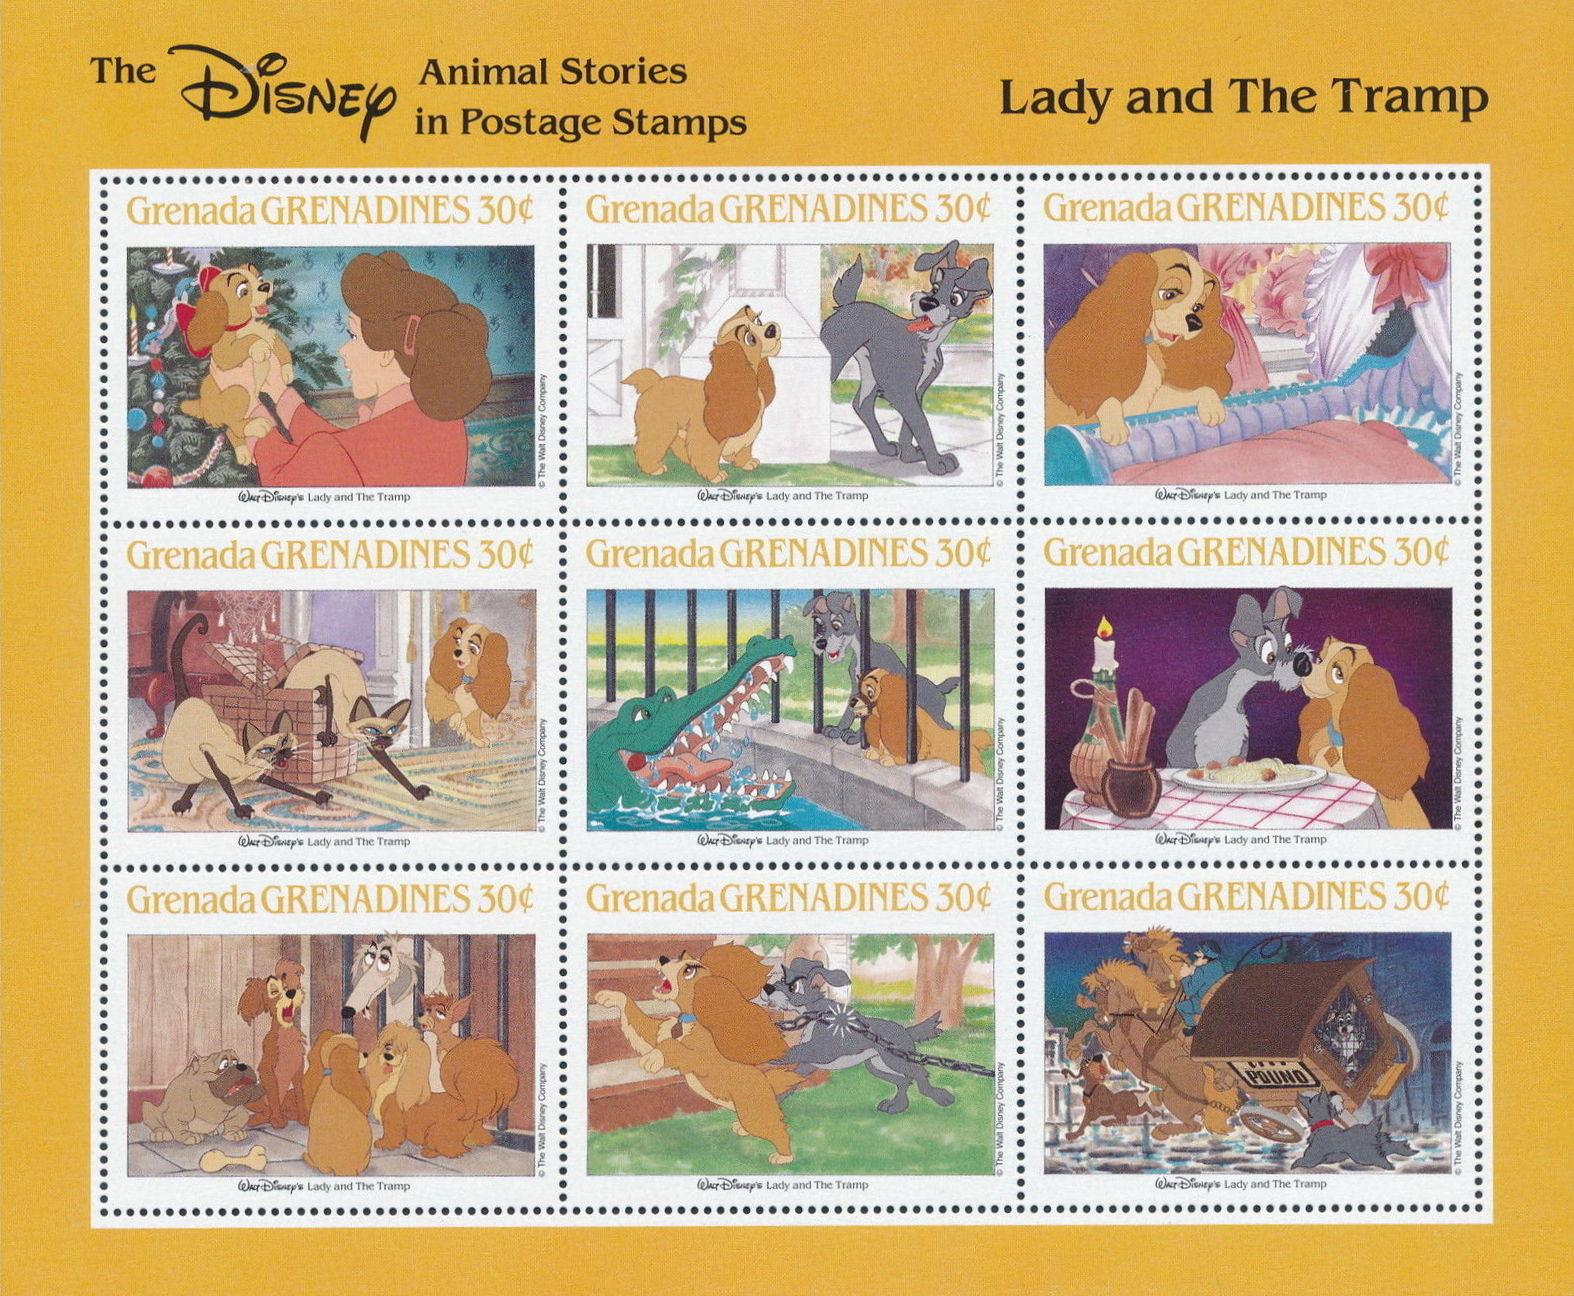 Grenada Grenadines 1988 The Disney Animal Stories in Postage Stamps SSe.jpg